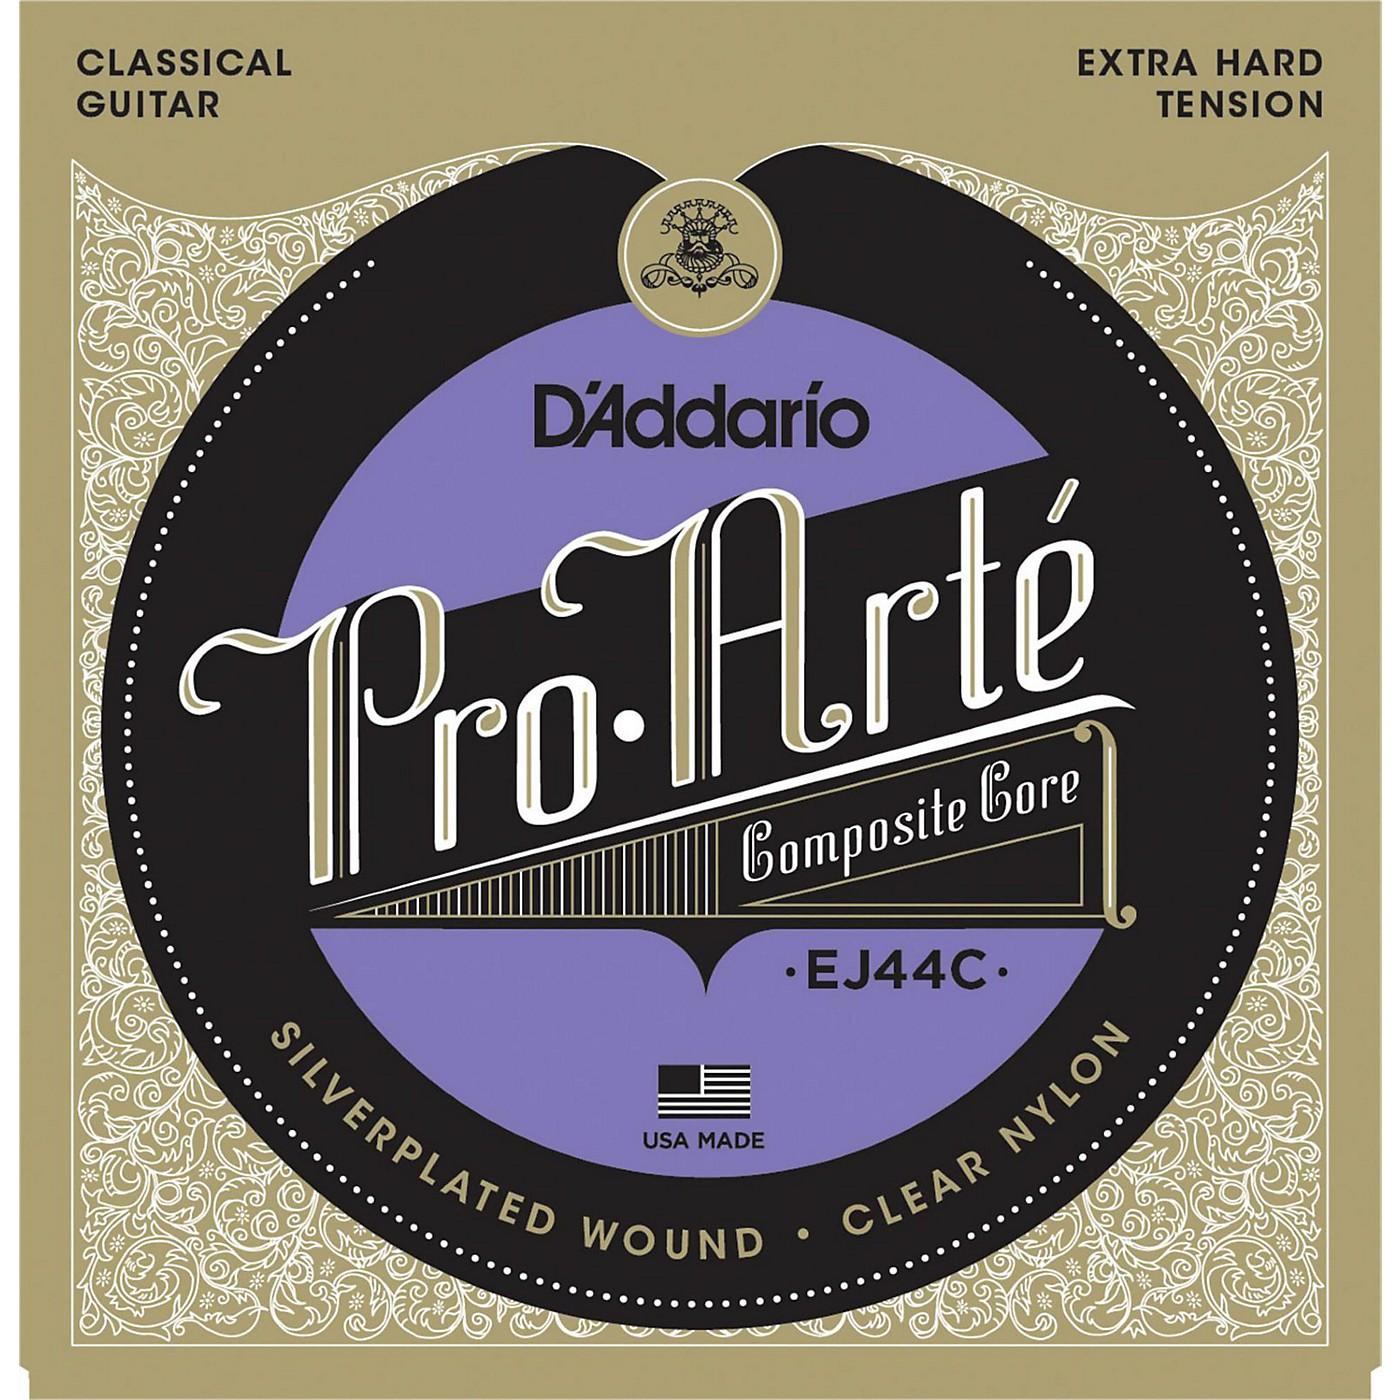 D'Addario EJ44C Pro-Arte Composites Extra Hard Classical Guitar Strings thumbnail